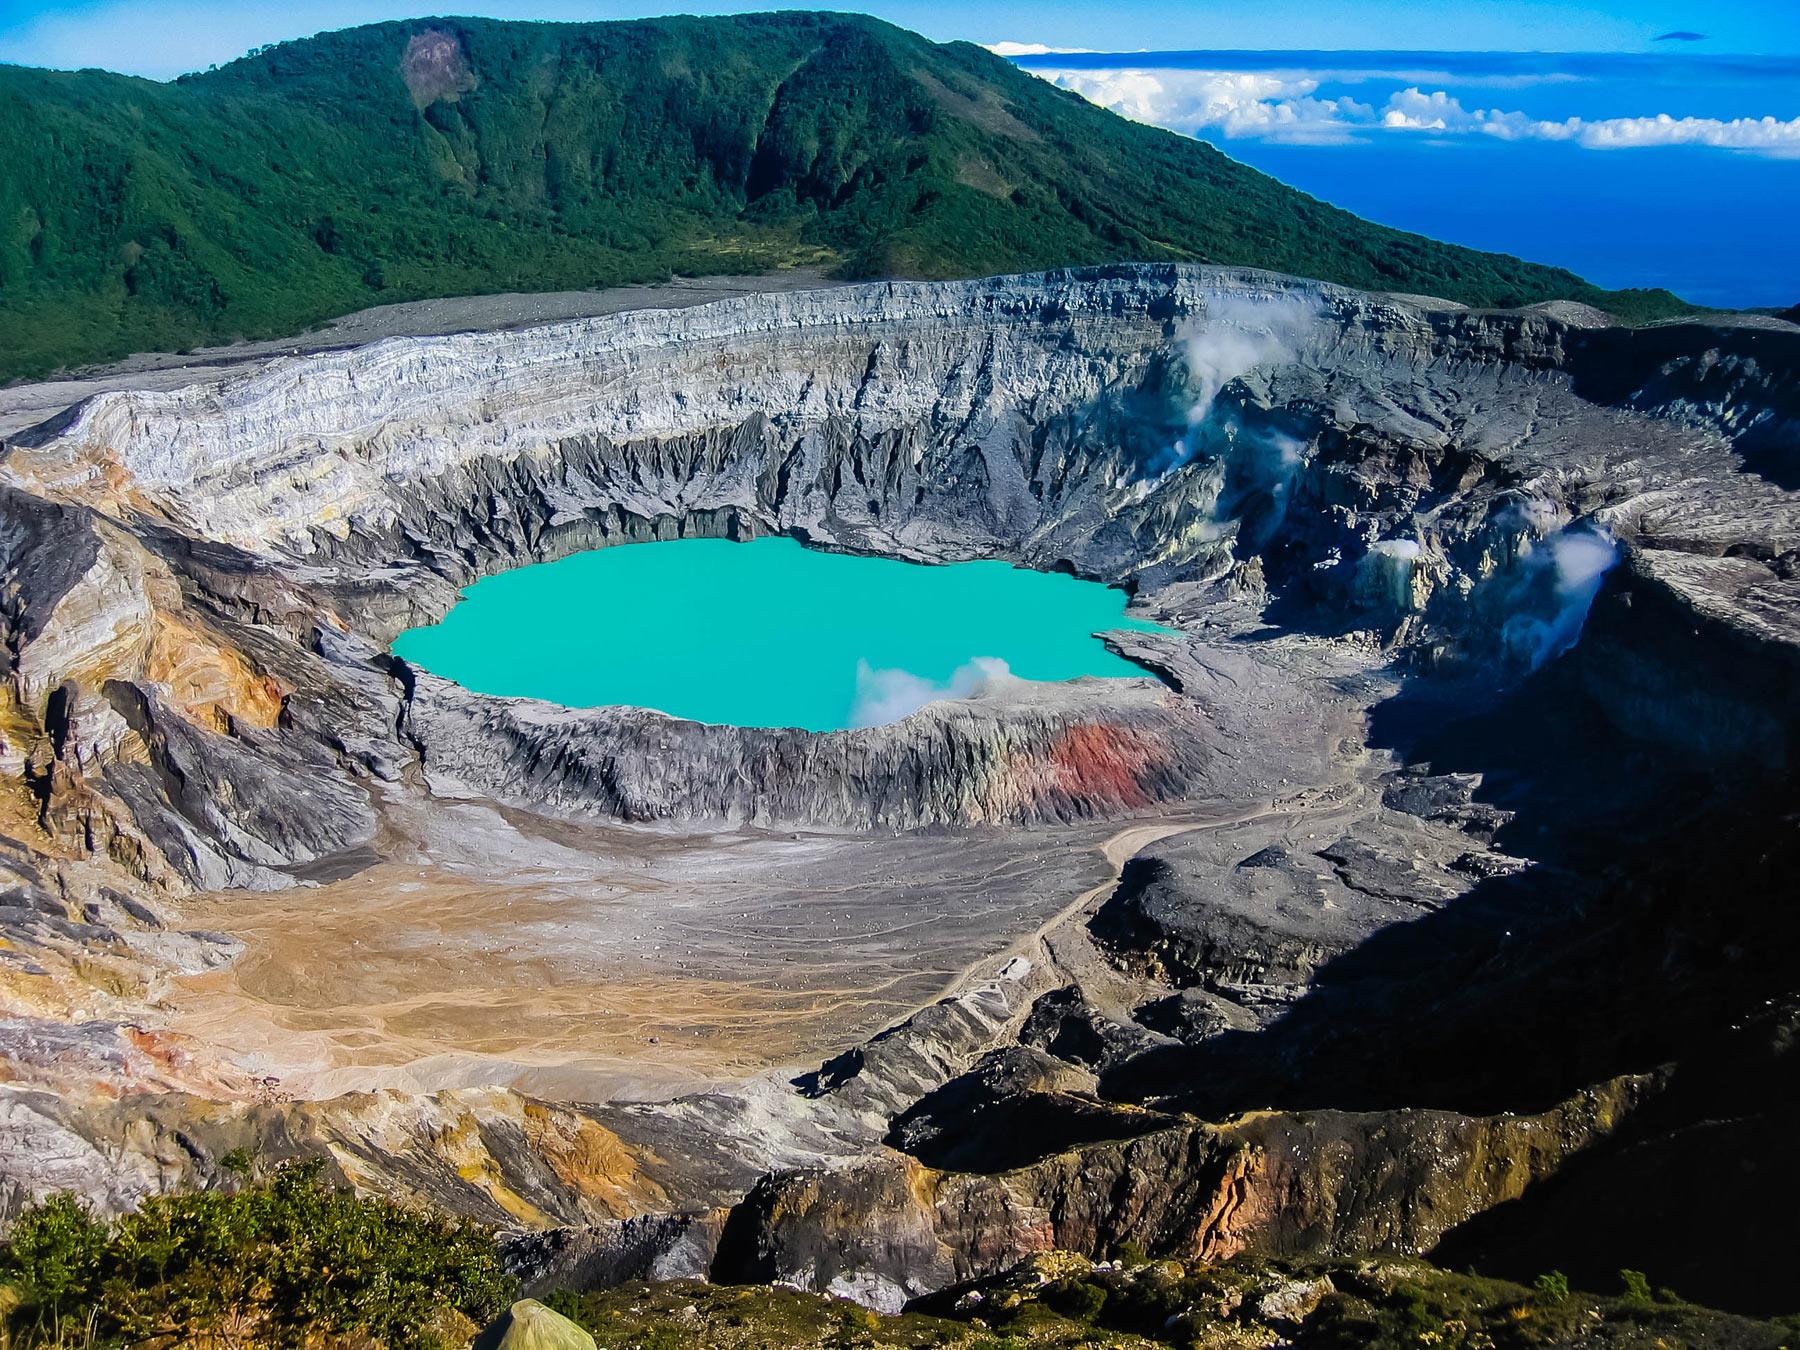 Poas Volcano Opening Again In Costa Rica